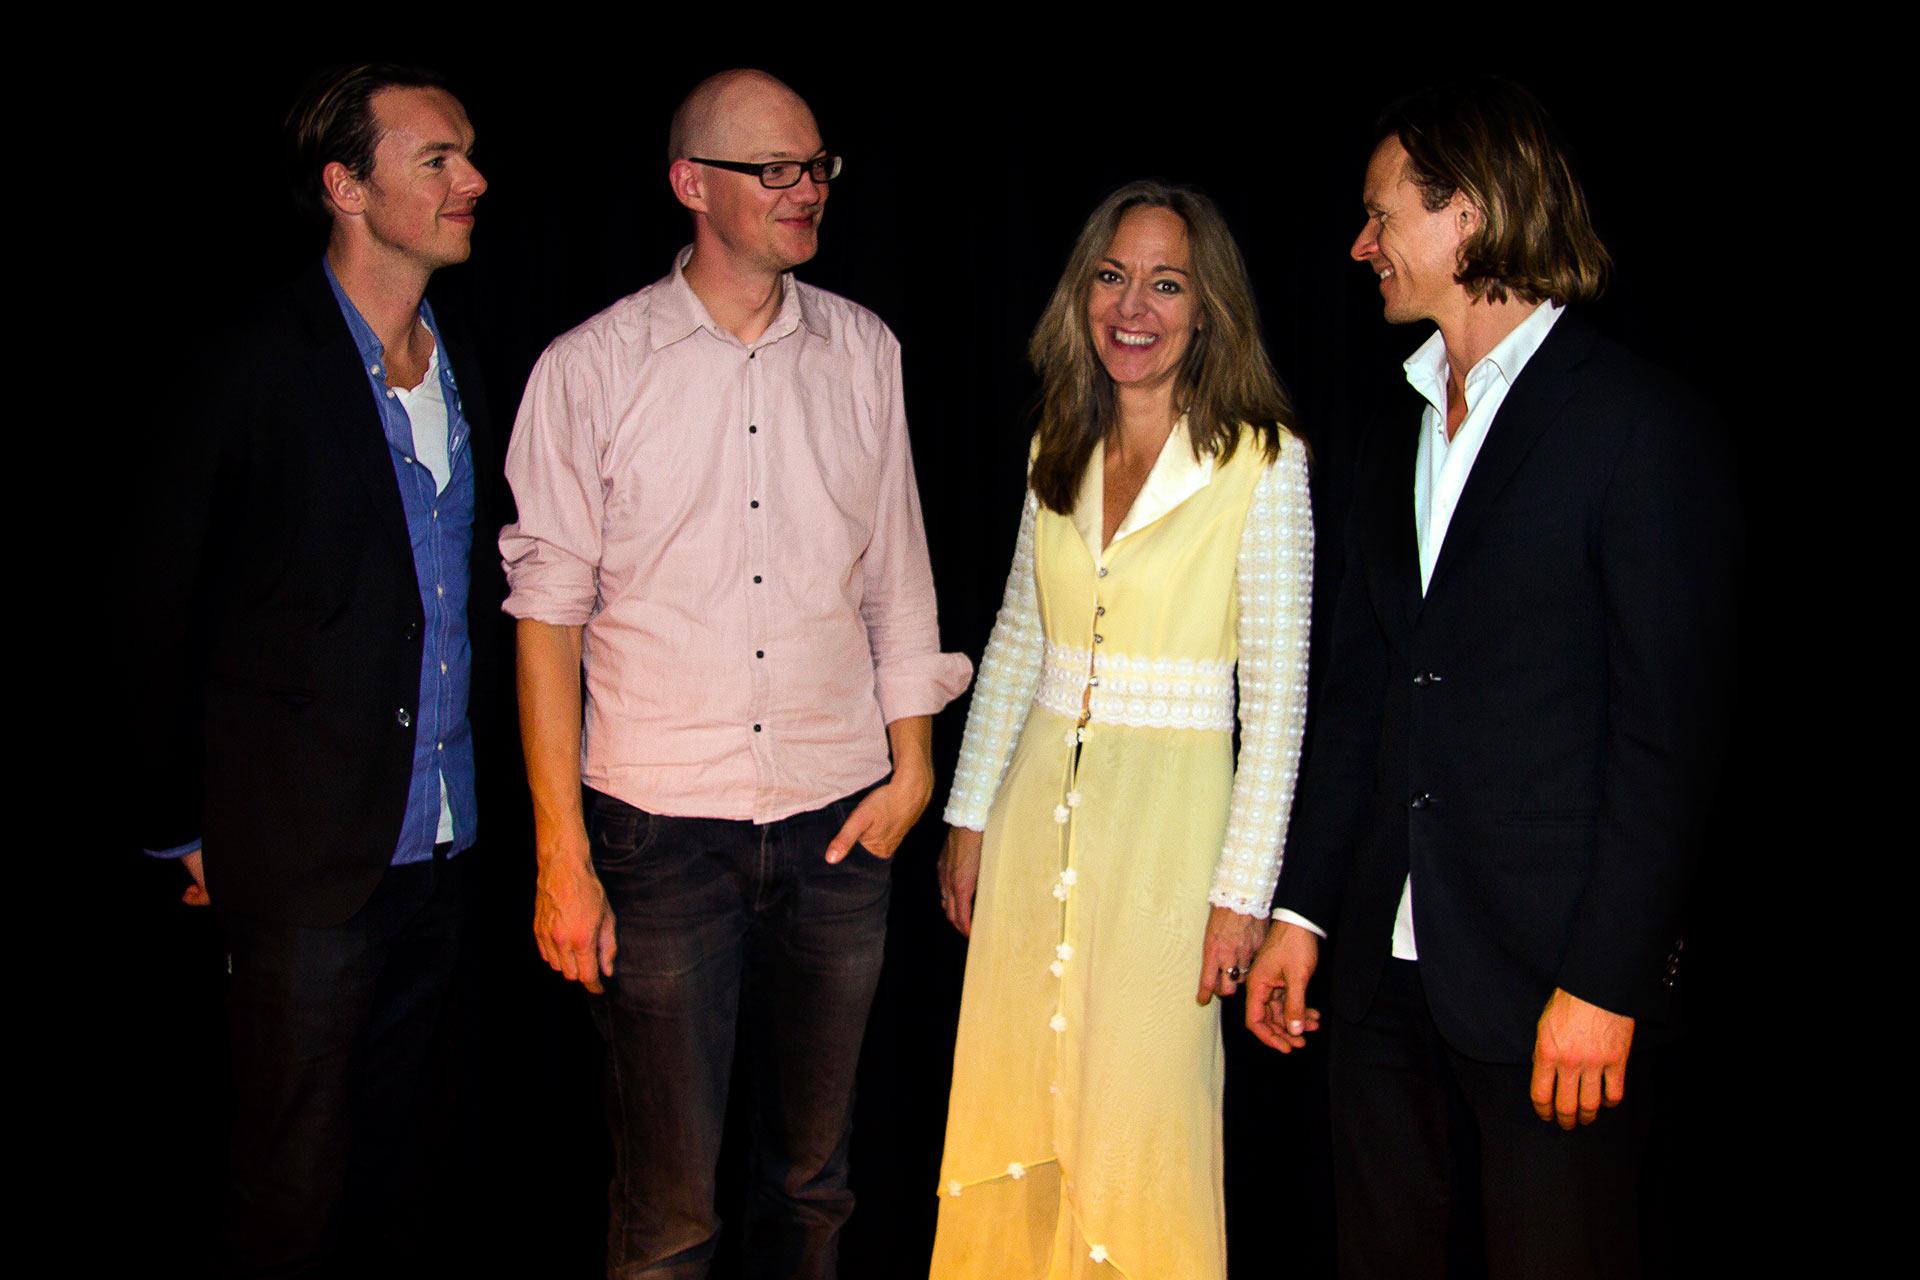 Morten Ankarfeldt, Mads Søndergaard, Ninna Milner & Janus Templeton